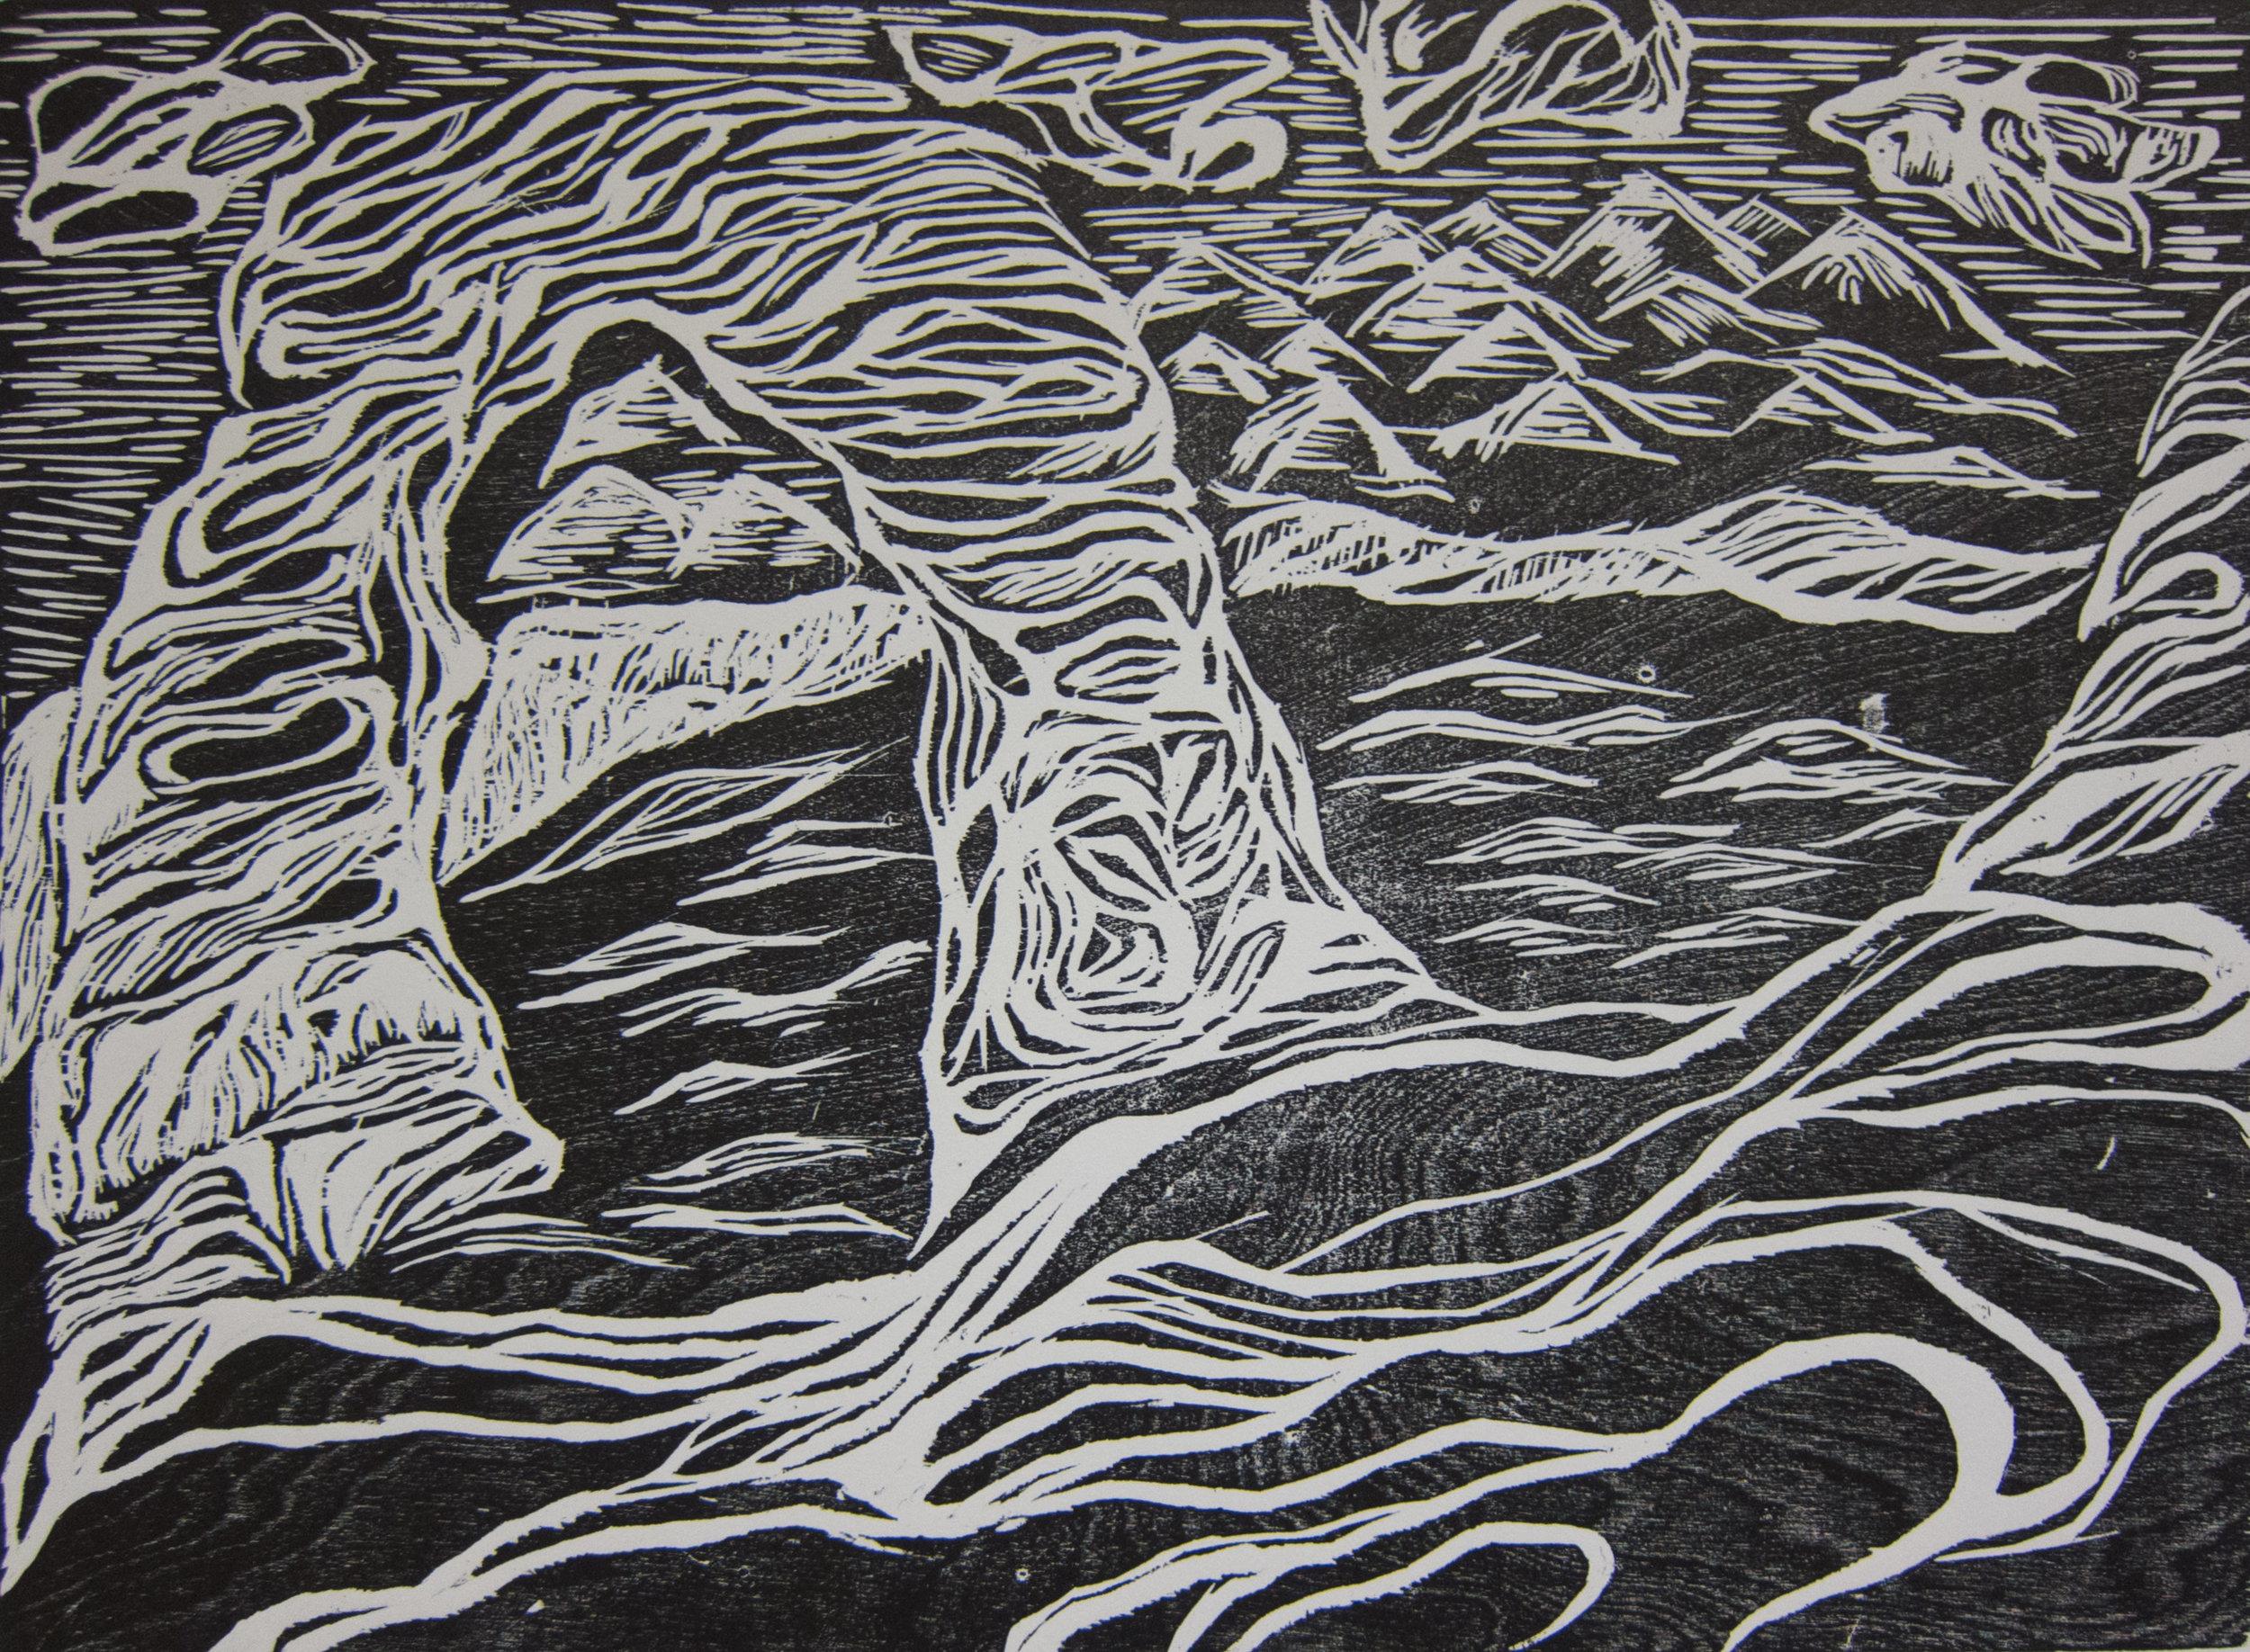 Woodcut/Relief